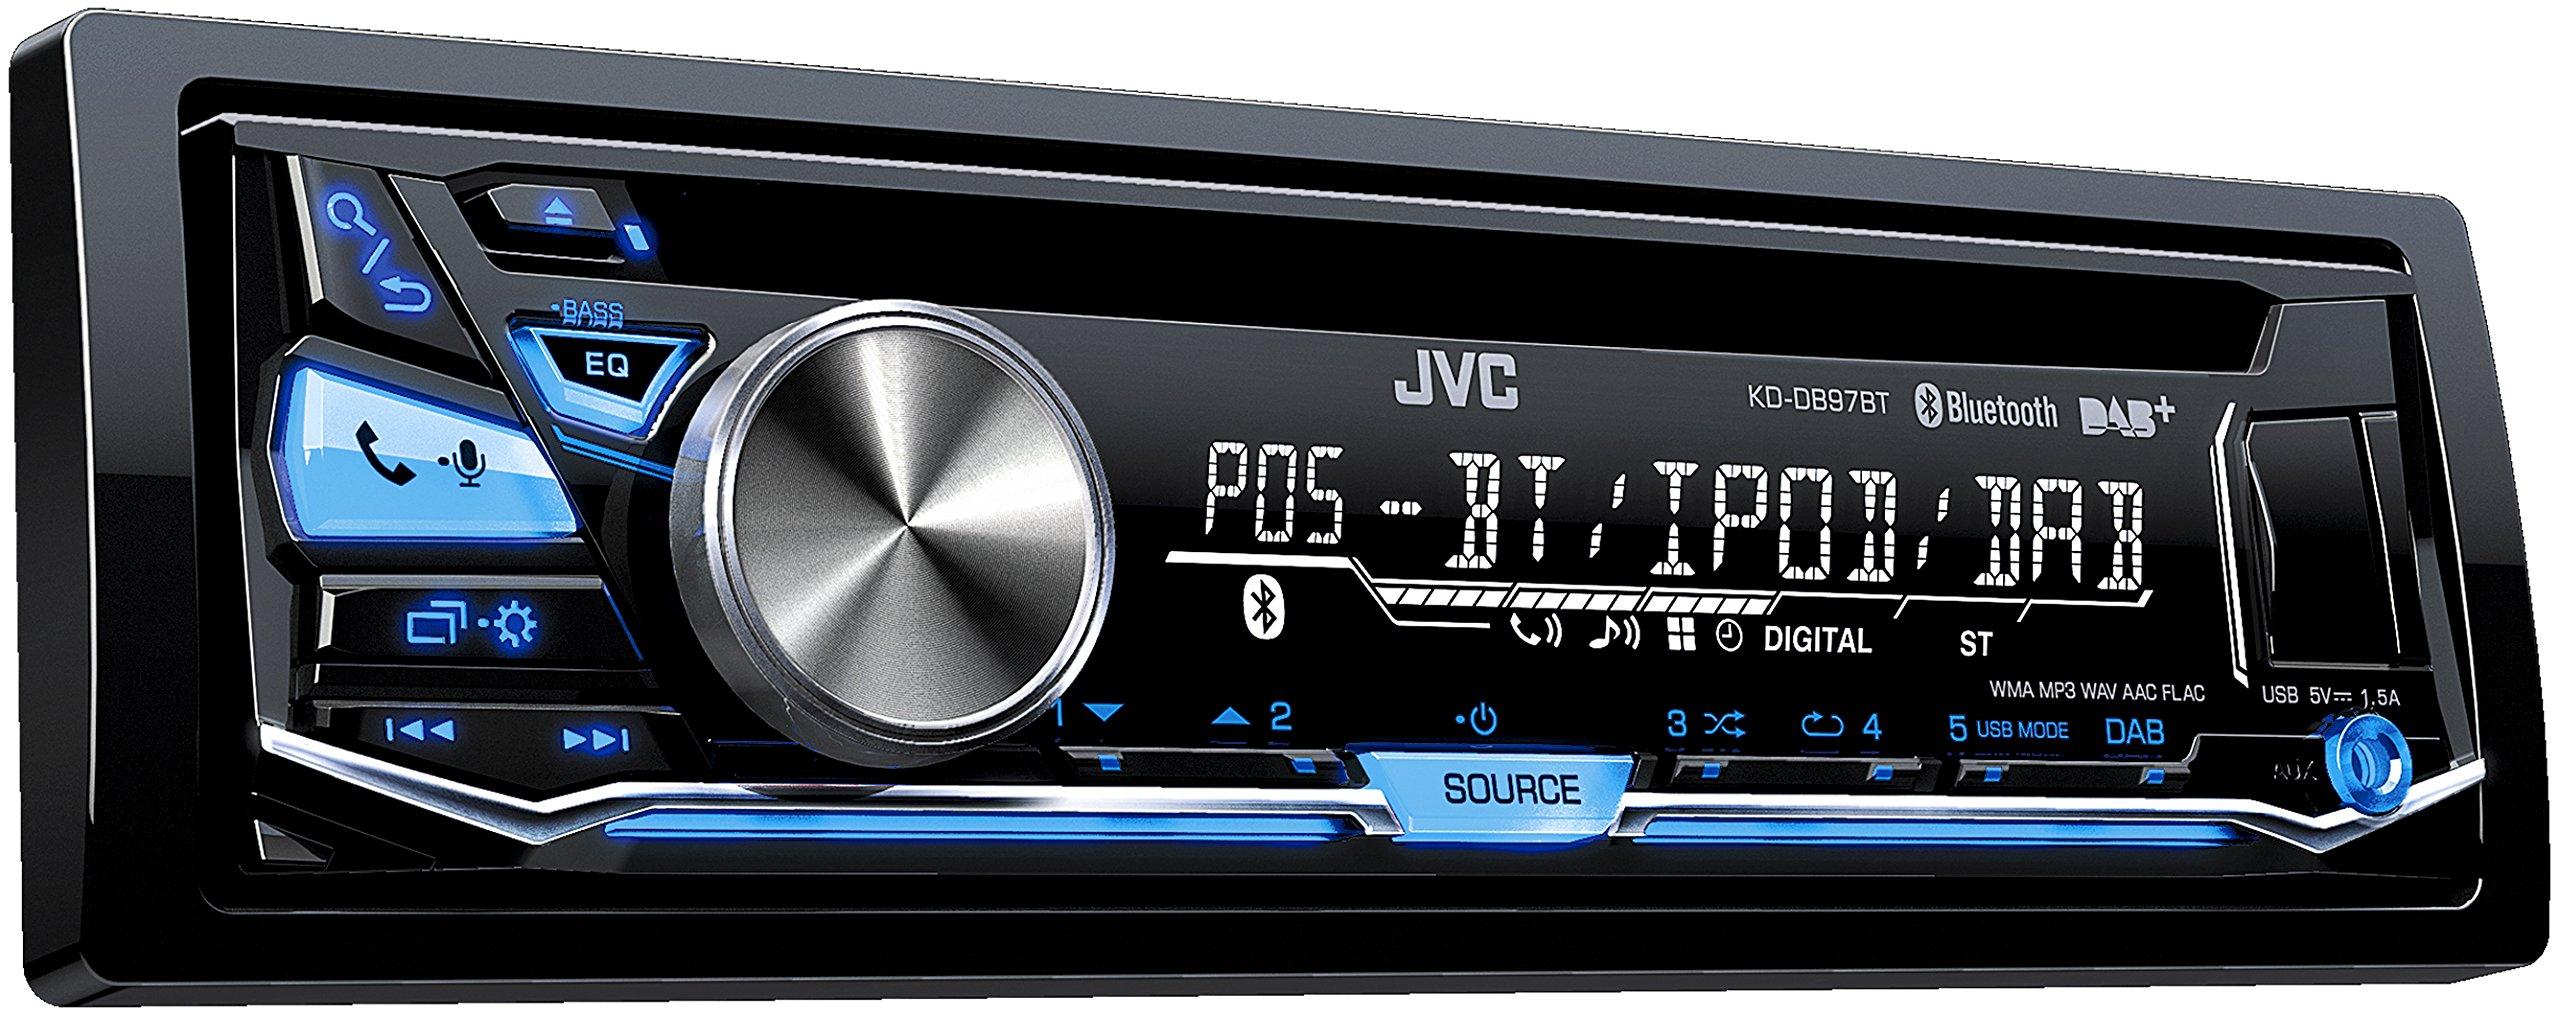 JVC-KD-DB97BT-USBCD-Receiver-DAB-Front-AUX-Bluetooth-schwarz